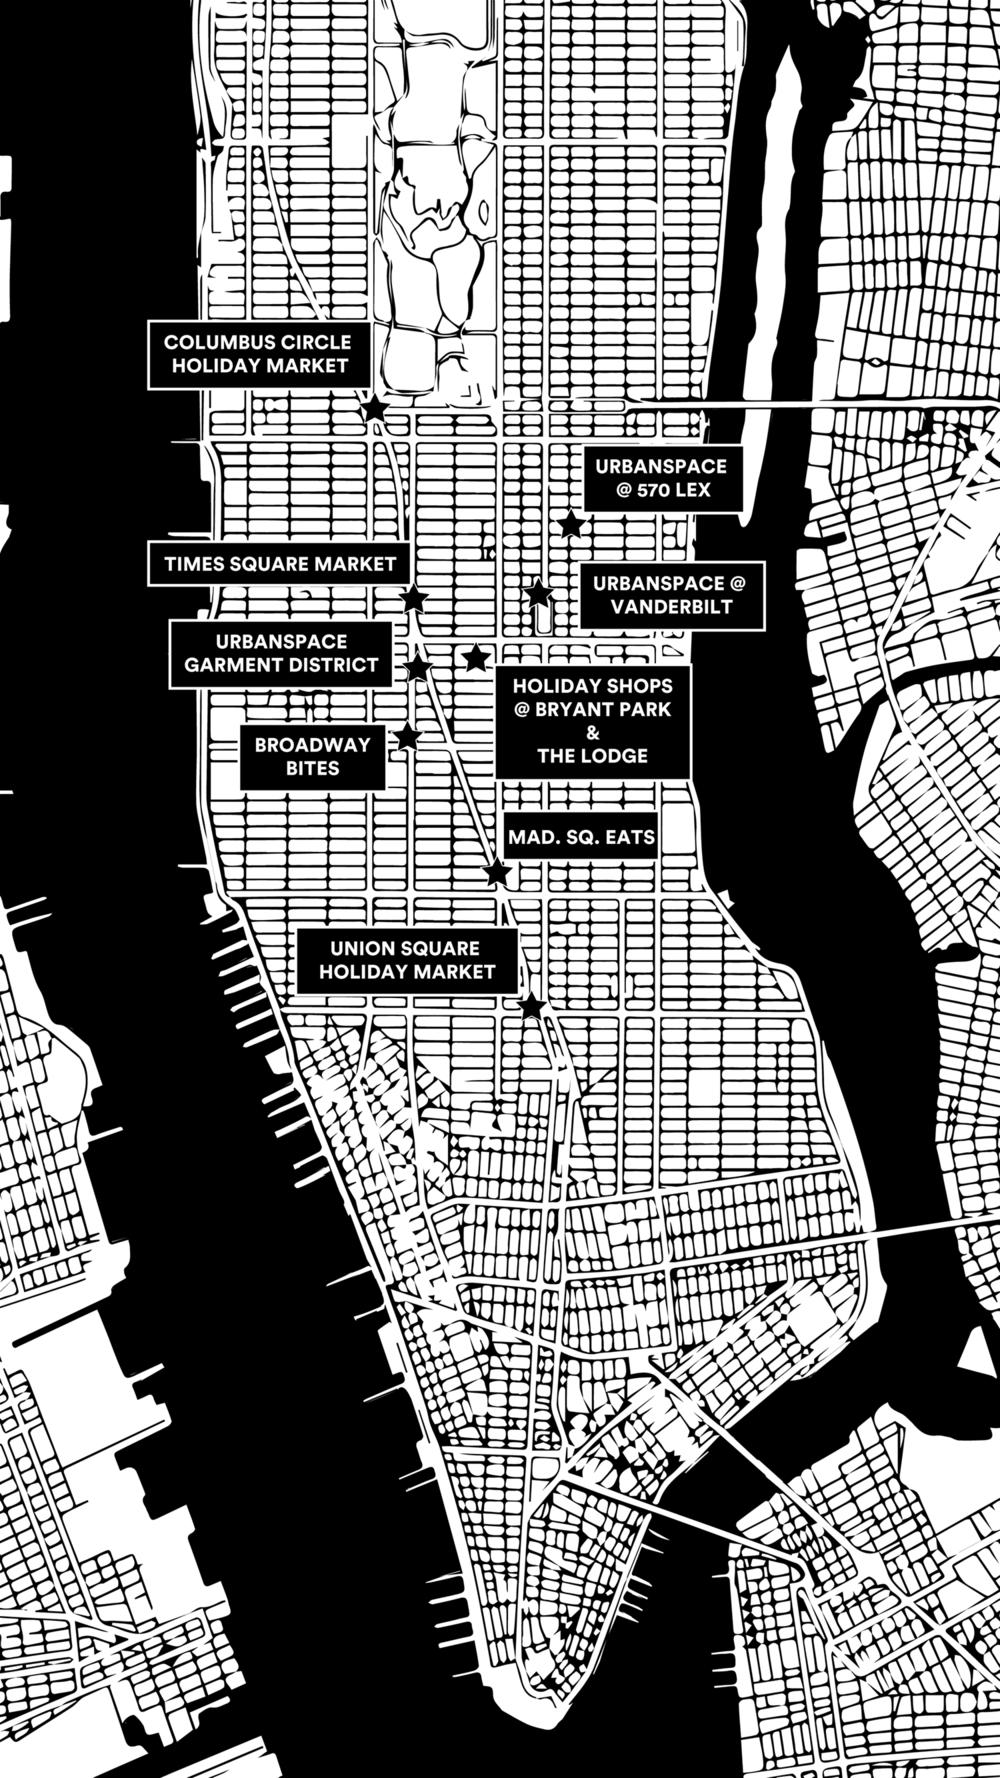 Bryant Park Subway Map.Market Map Urbanspace